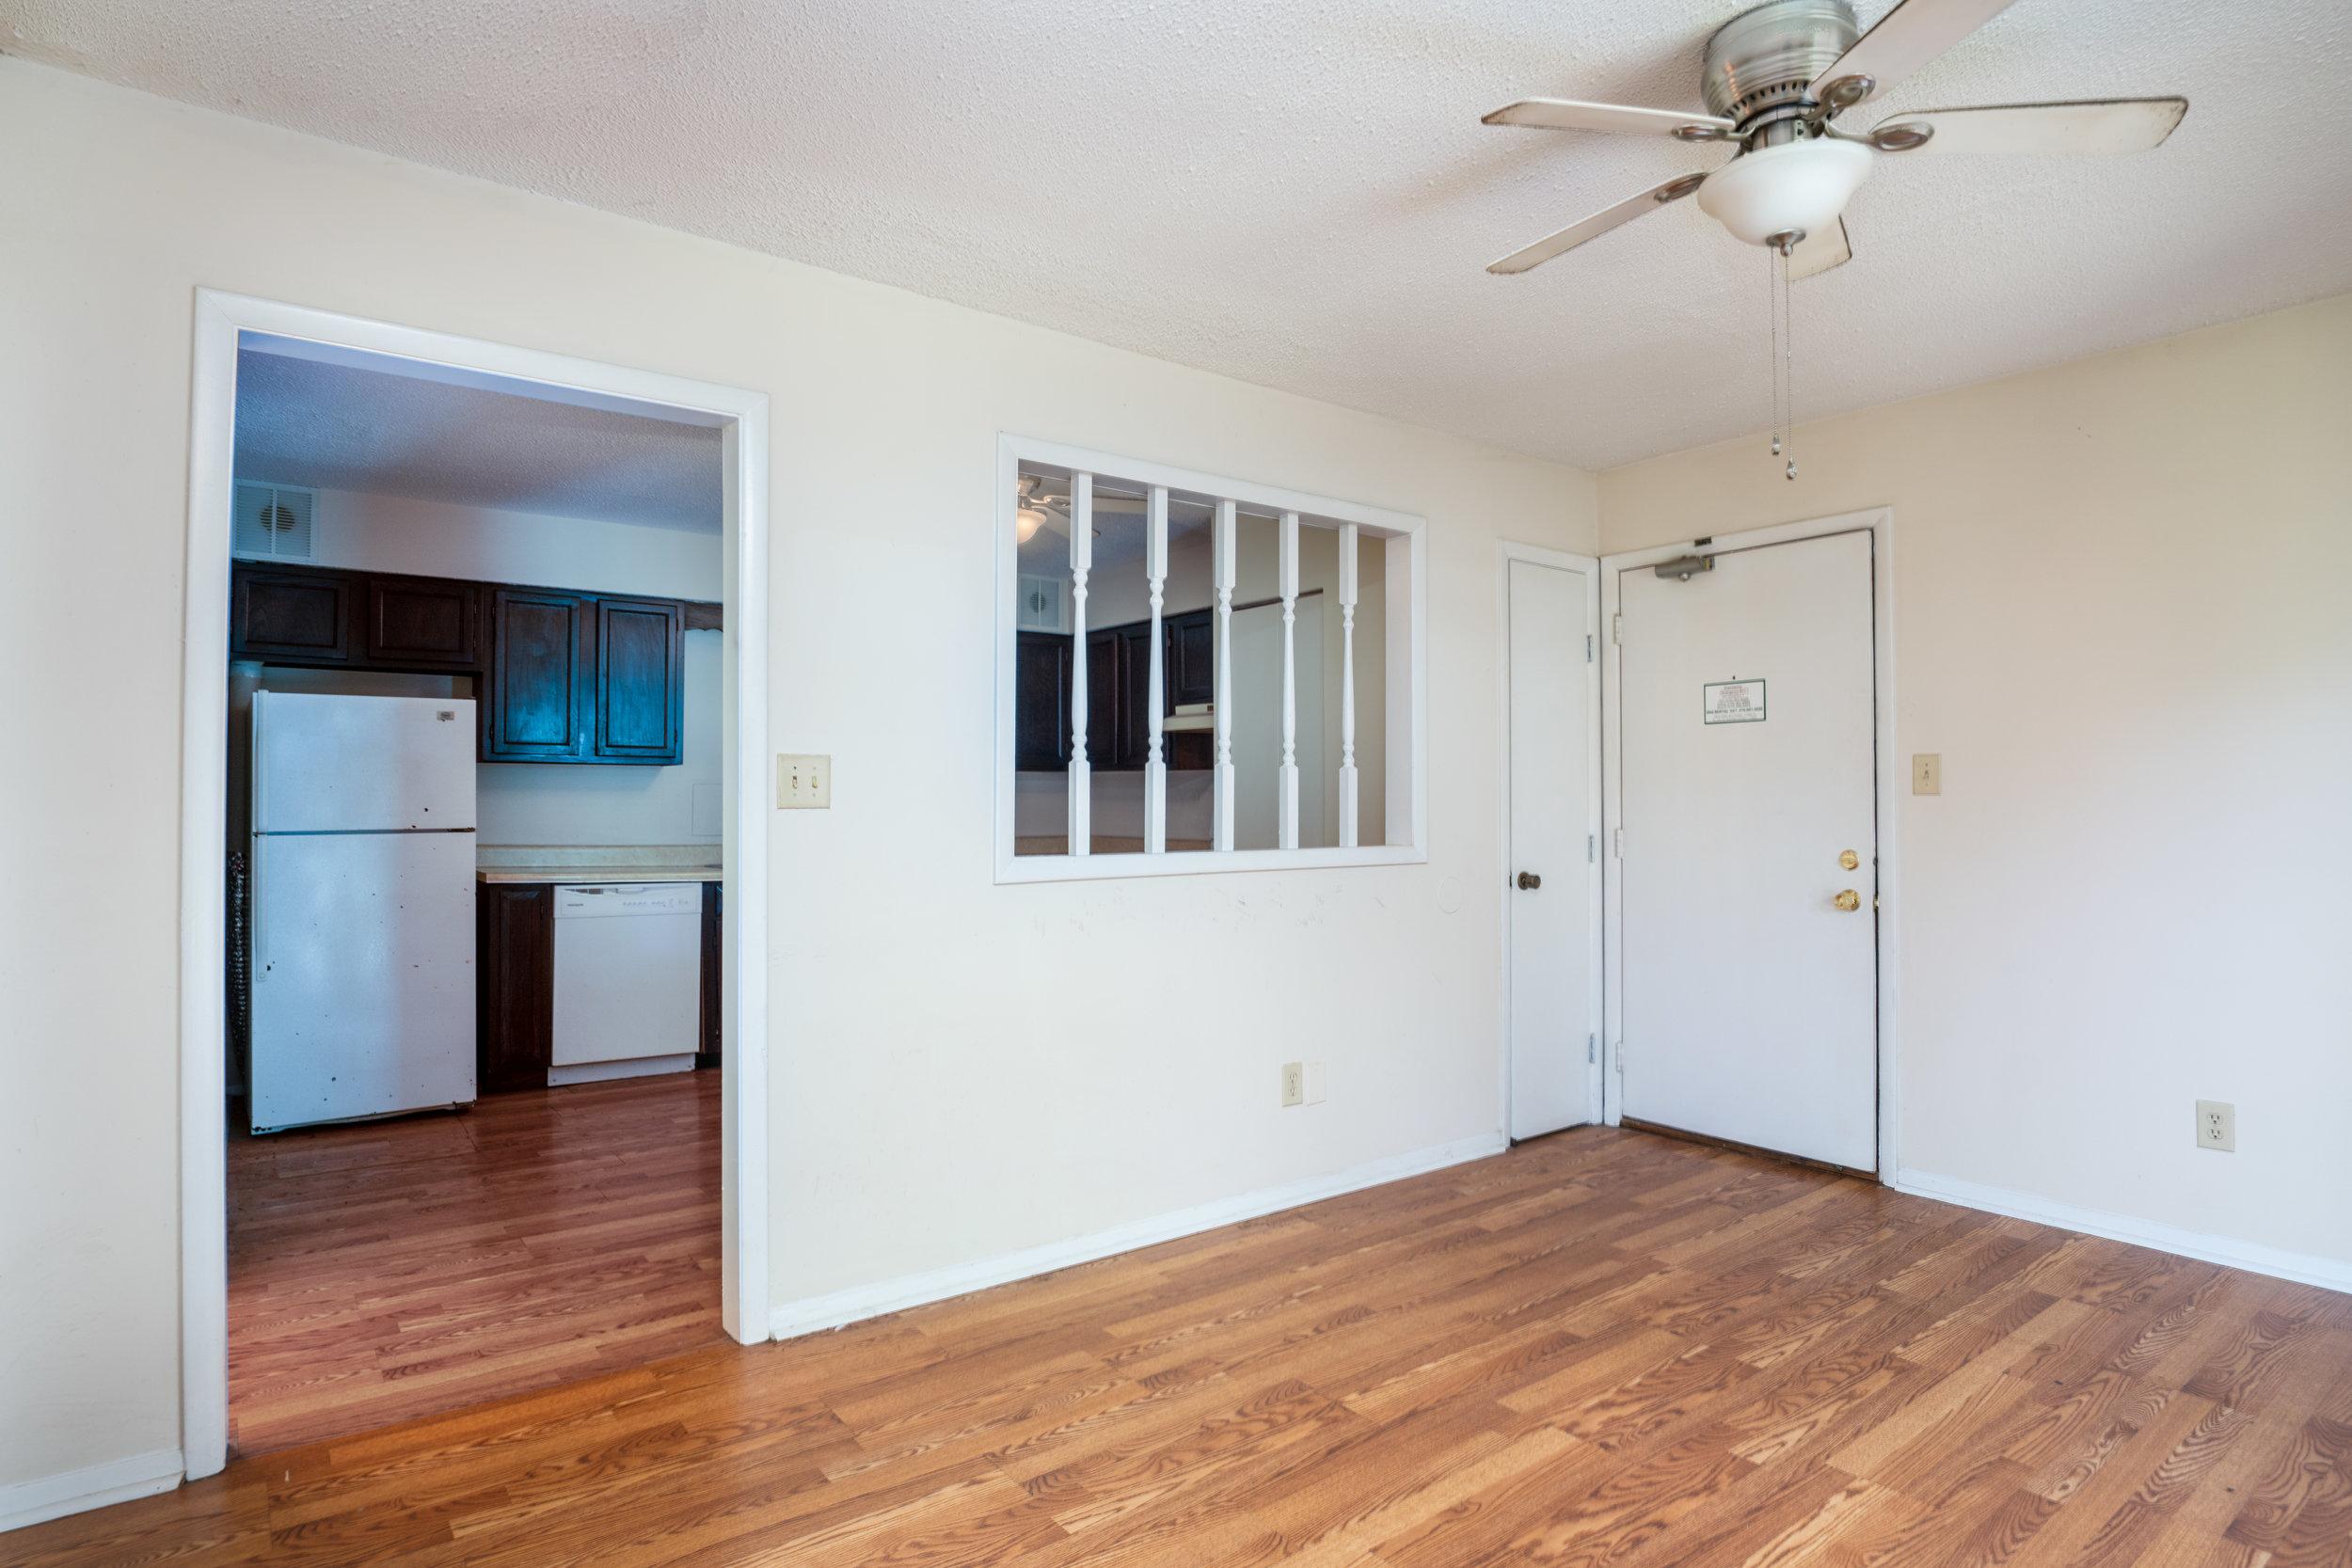 1BR/1Bon Living Room